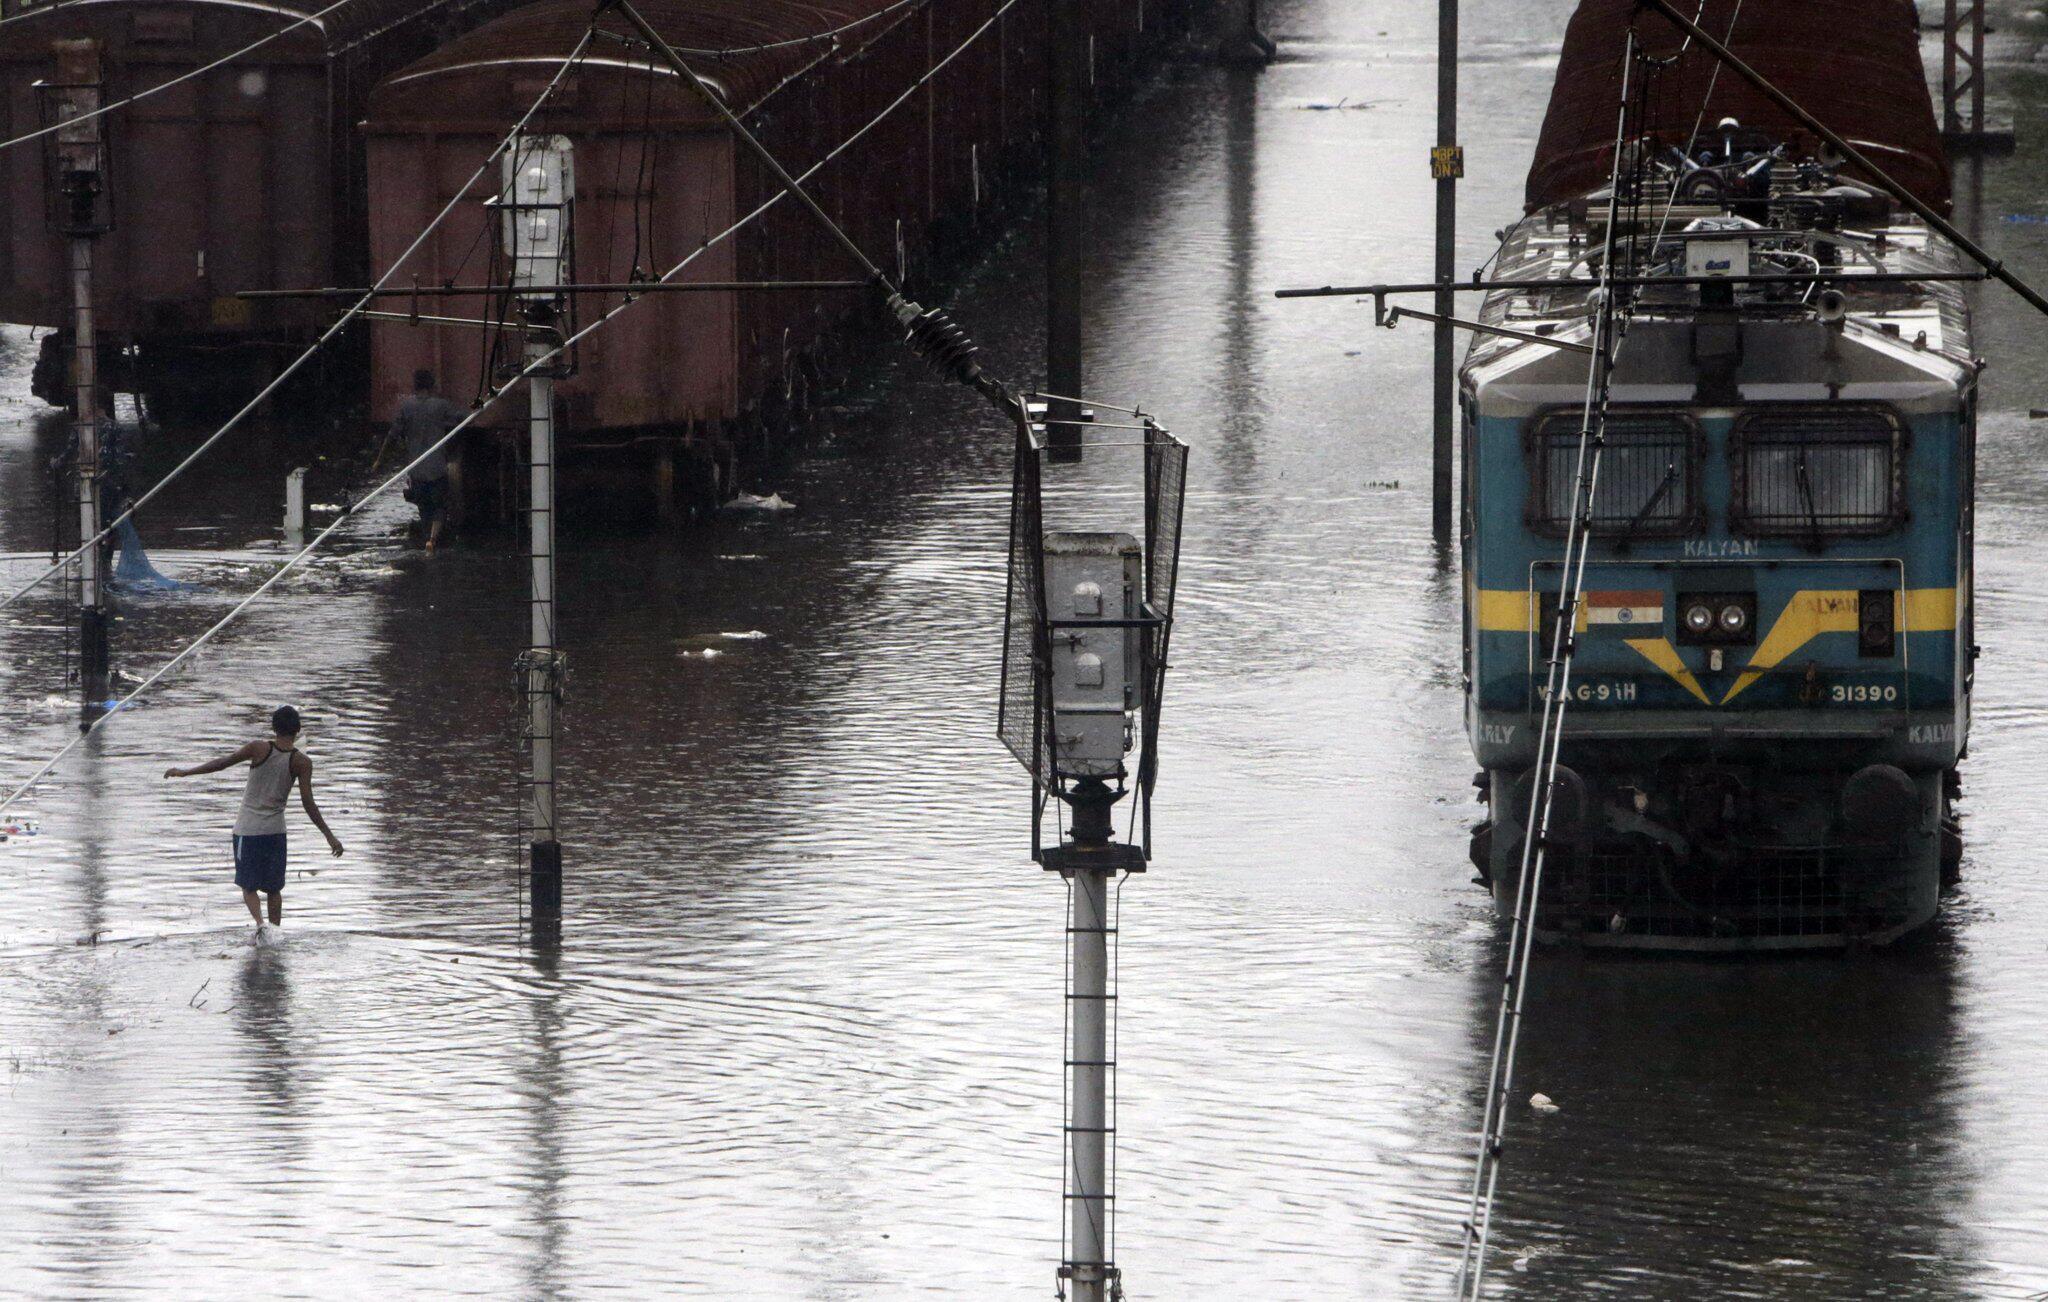 Bild zu Monsun, Indien, Mumbai, Regen, Wassermassen